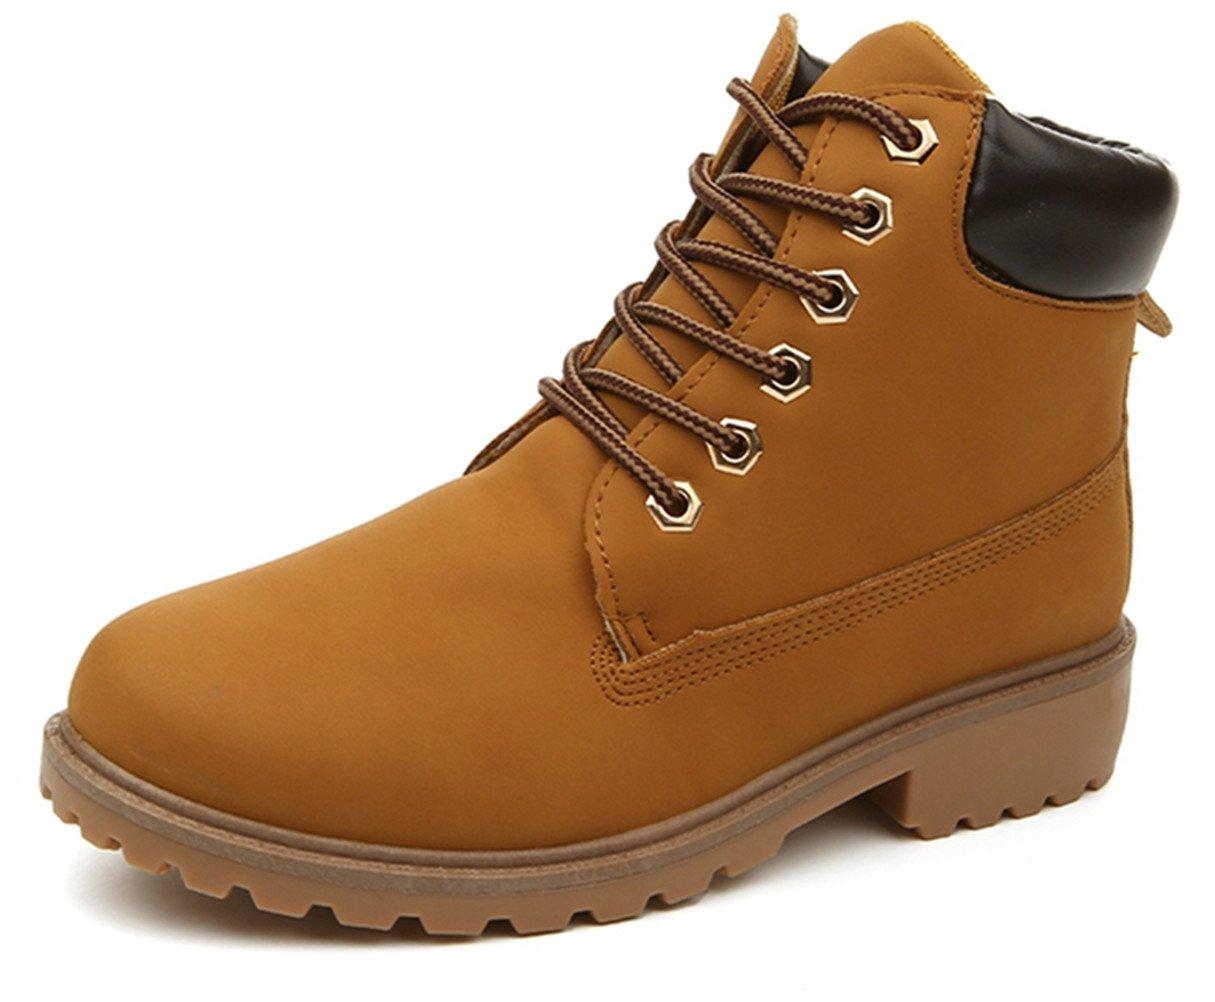 DADAWEN Women's Lace Up Low Heel Work Combat Boots Waterproof Ankle Bootie Yellow US Size 8